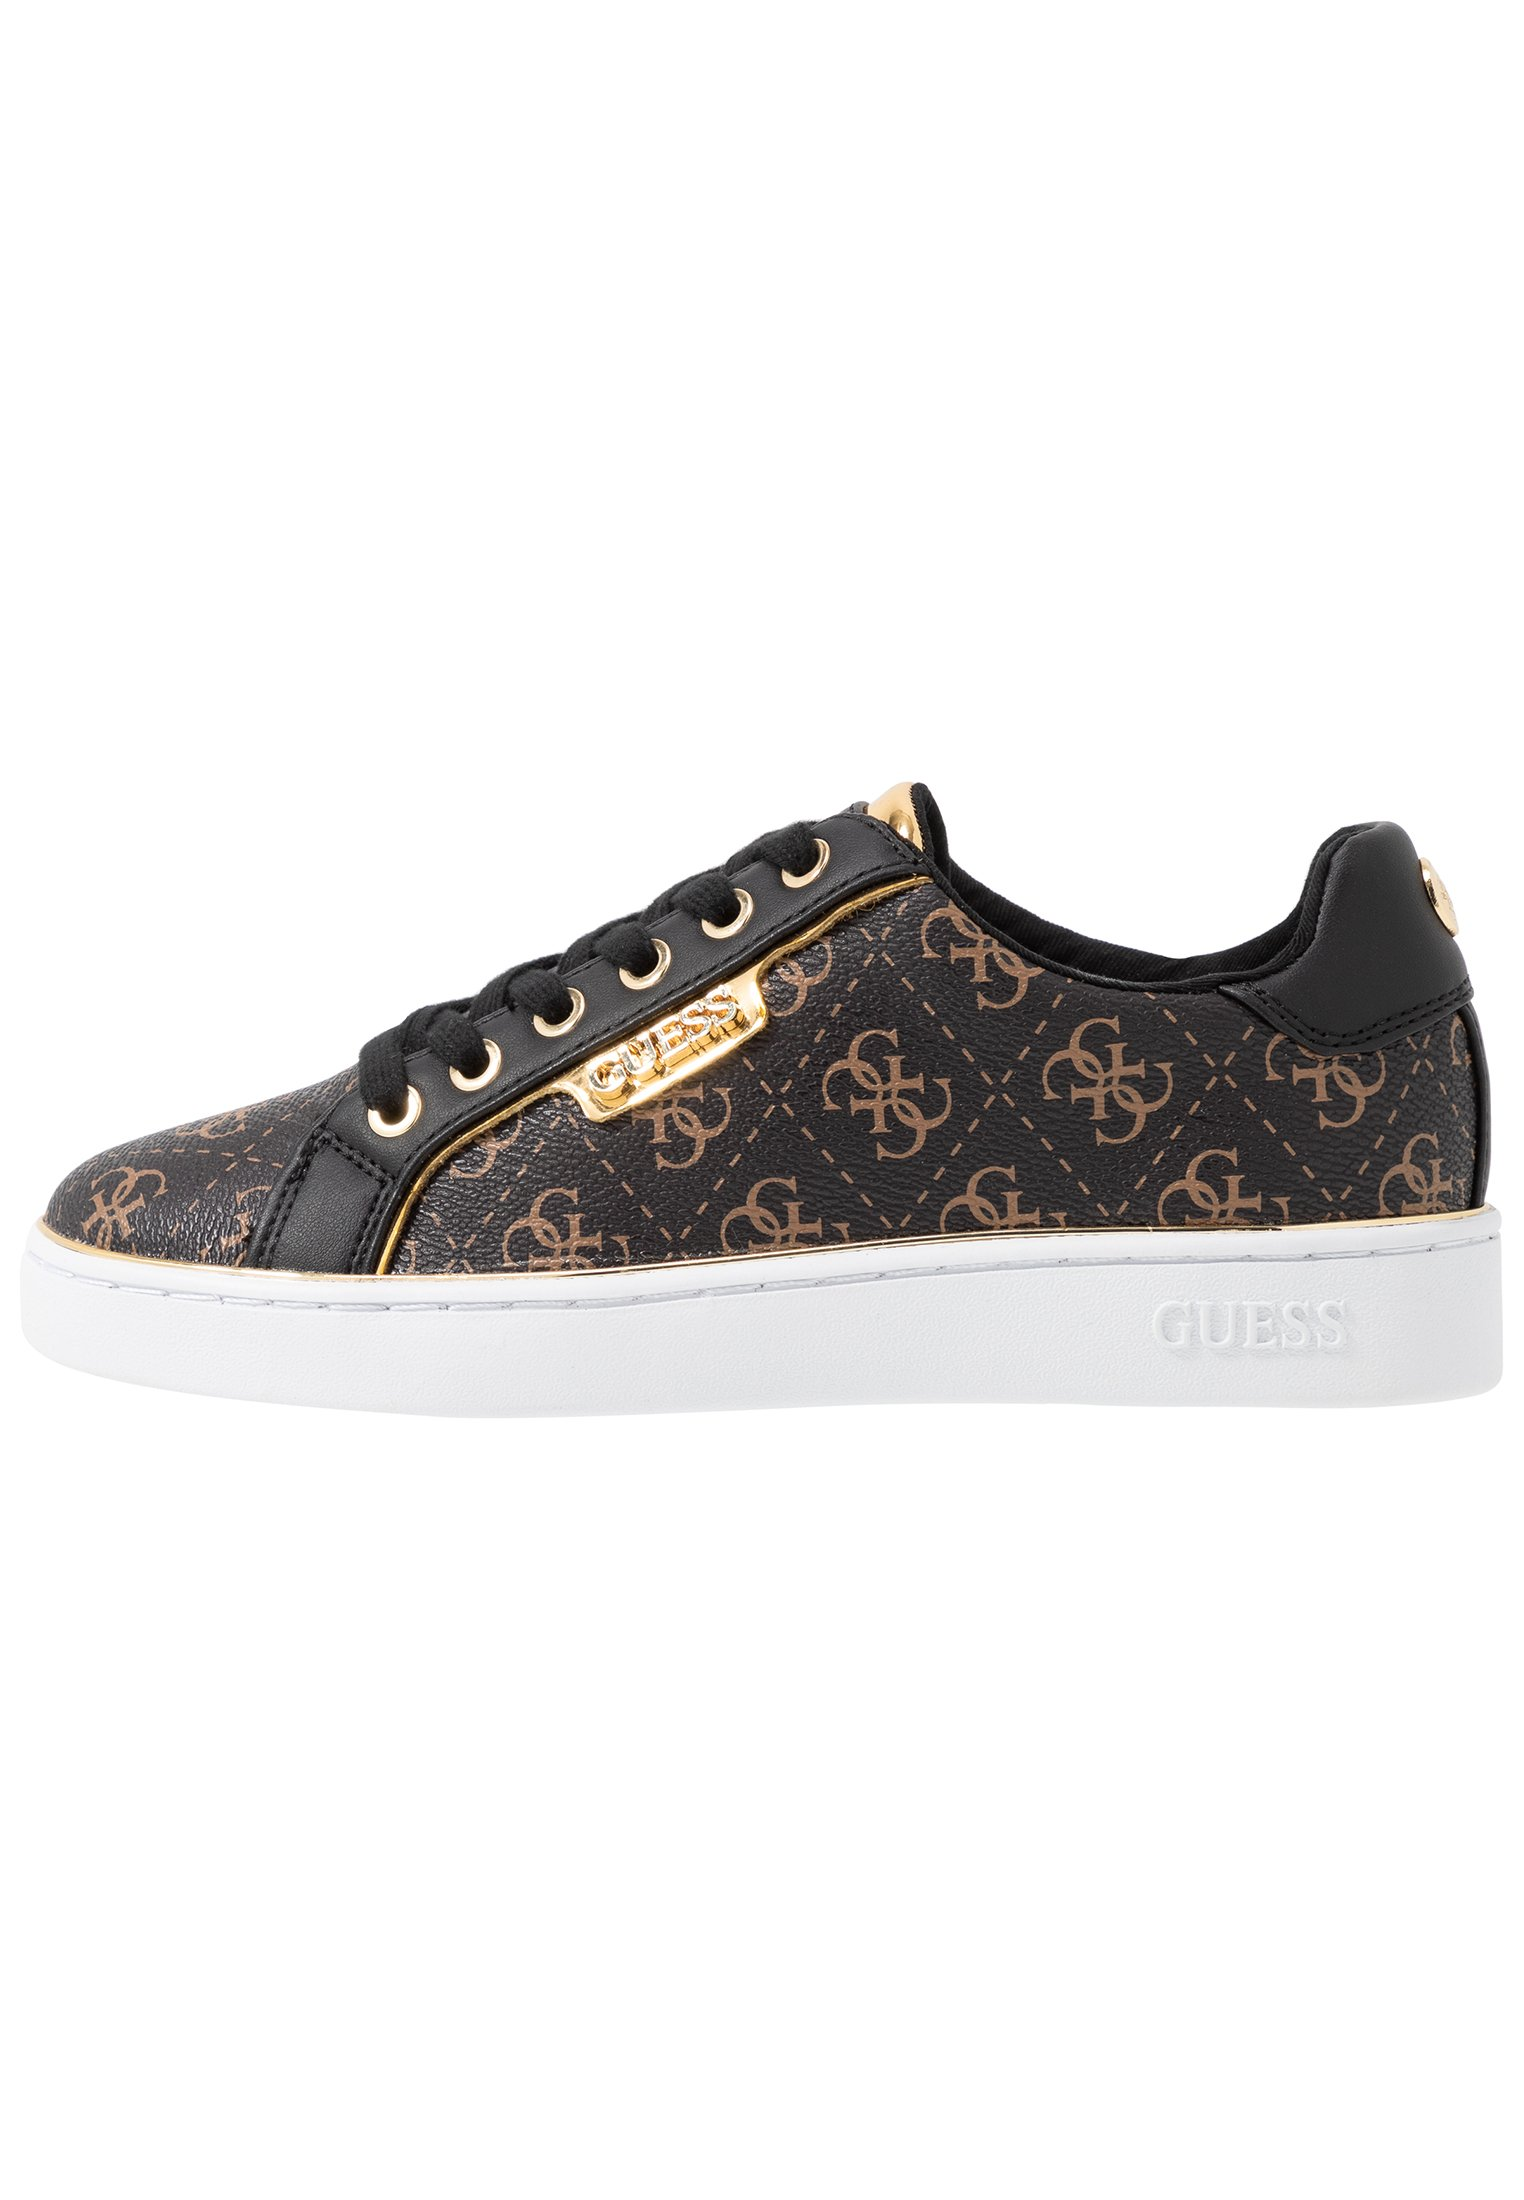 Guess Banq Sneakersy Damskie Obuwie Sneakersy ze wzorem